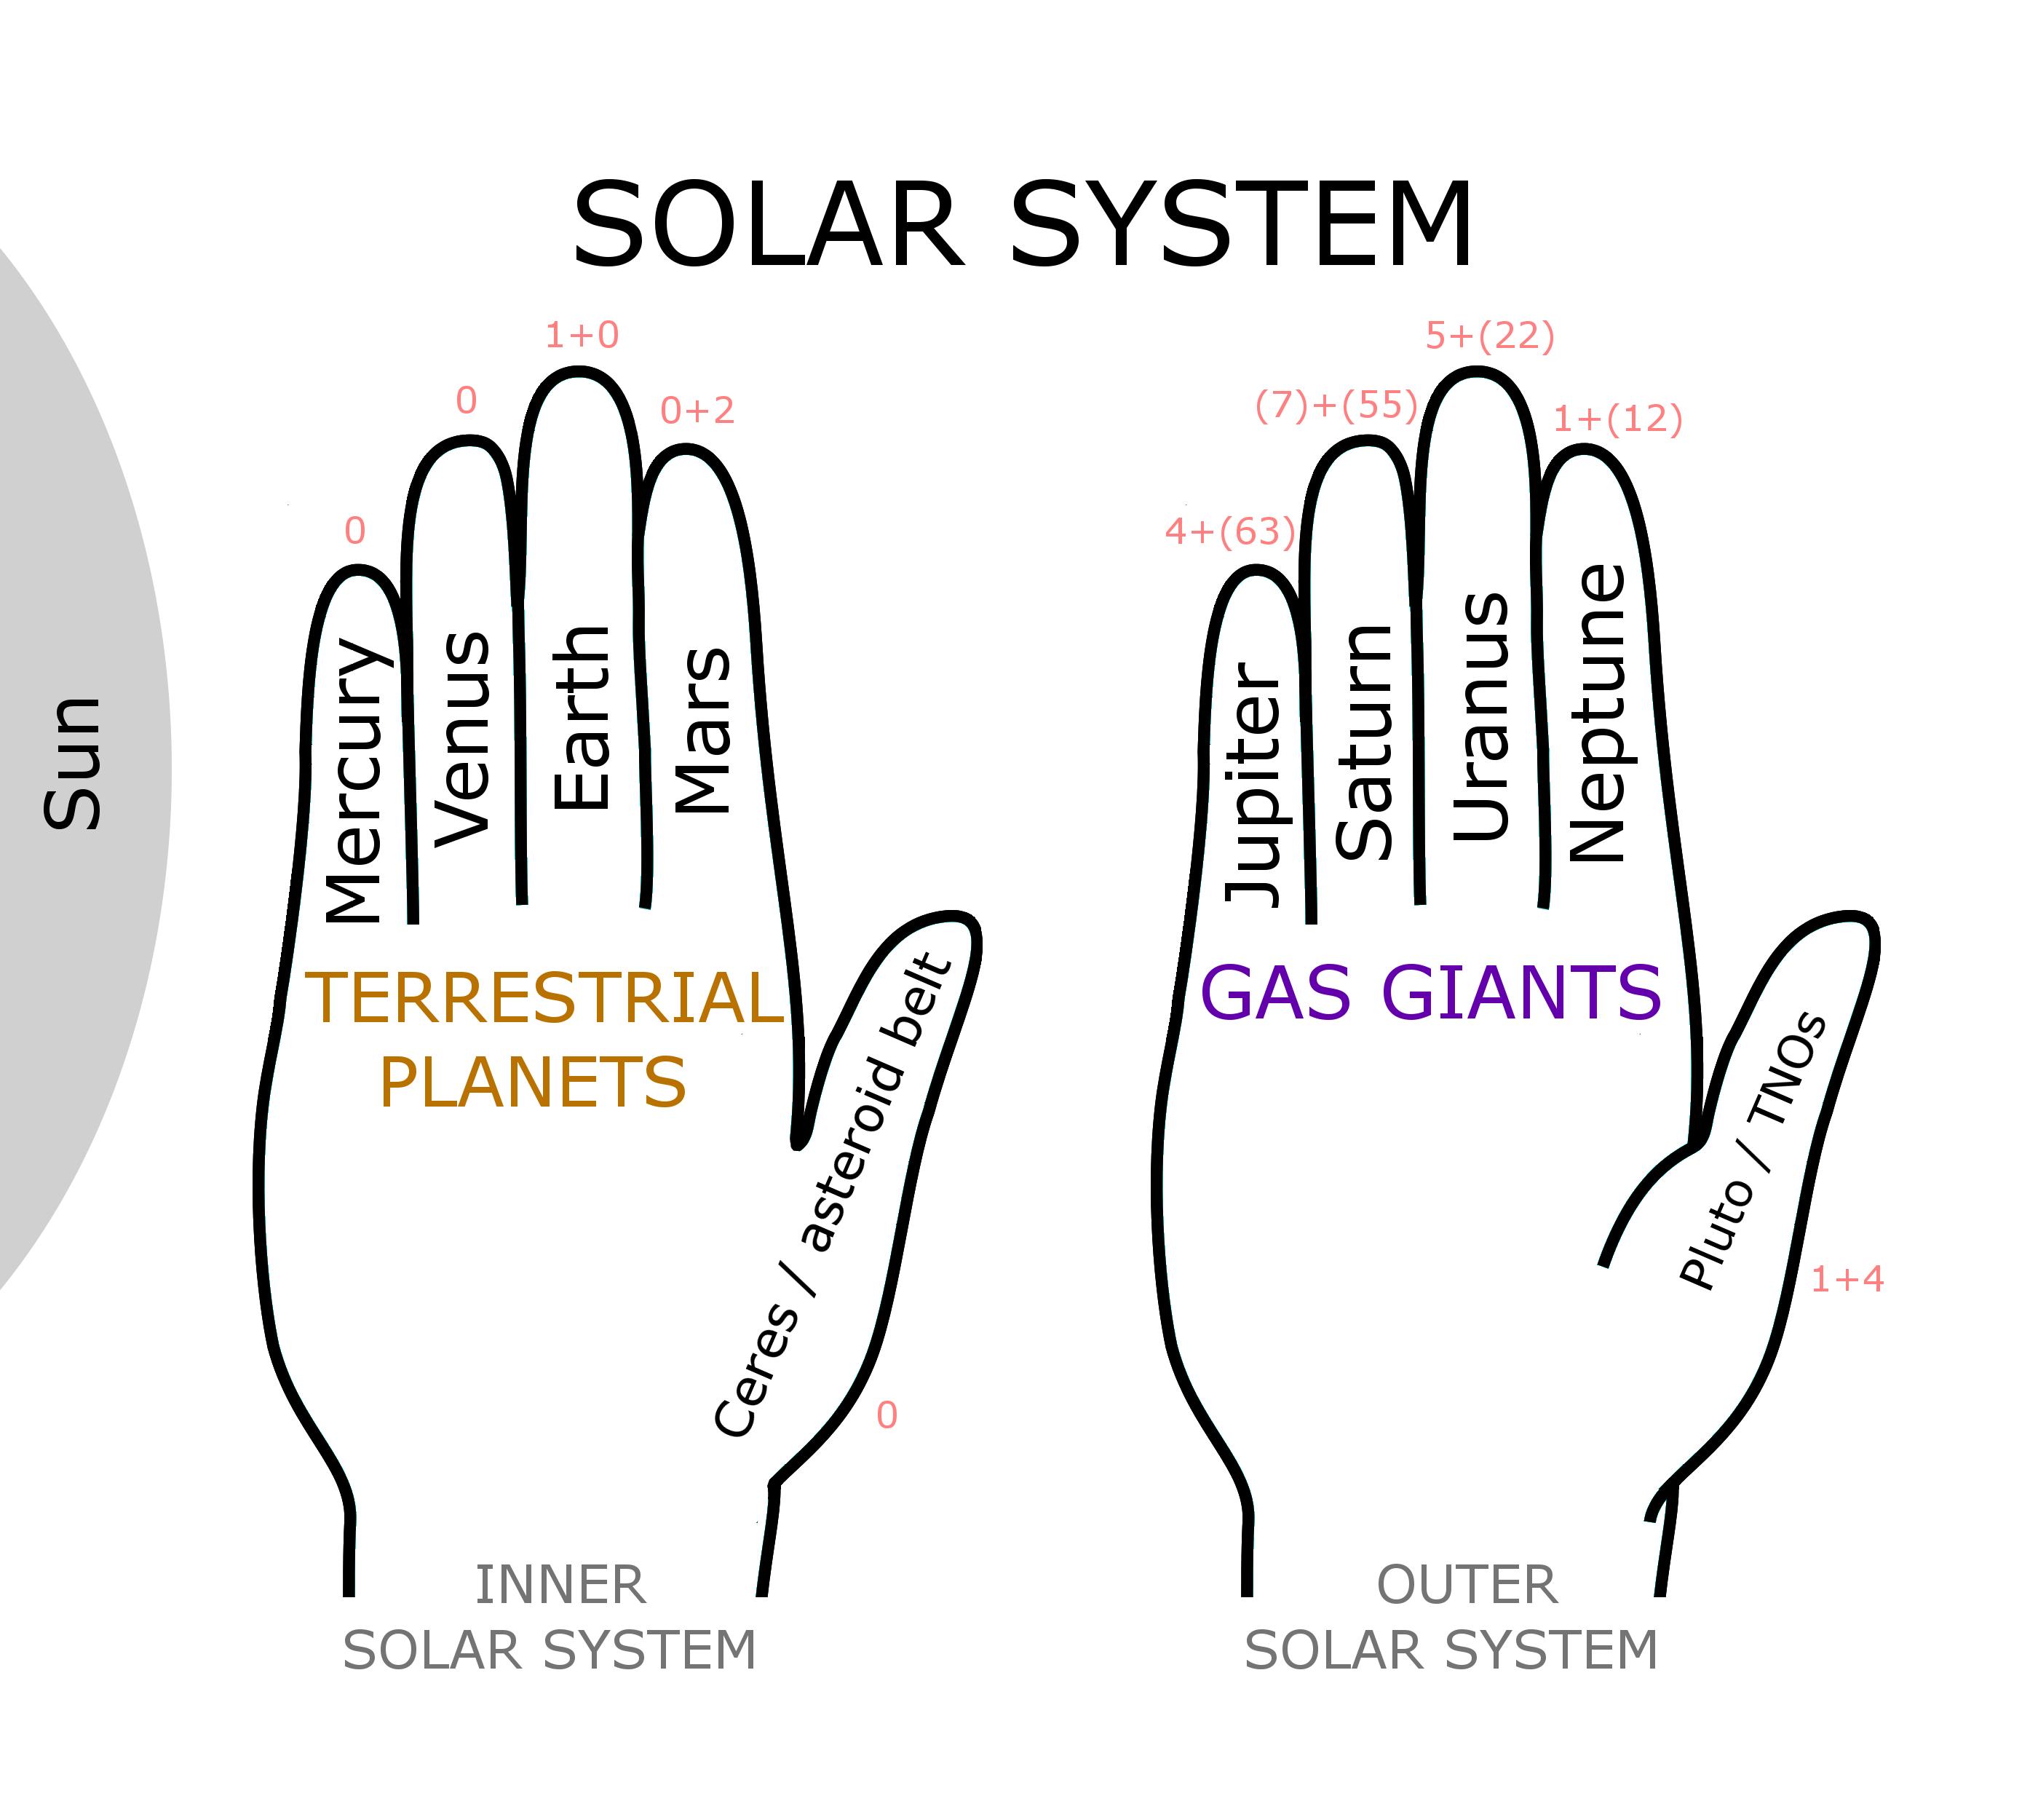 30 Solar System Diagram To Label